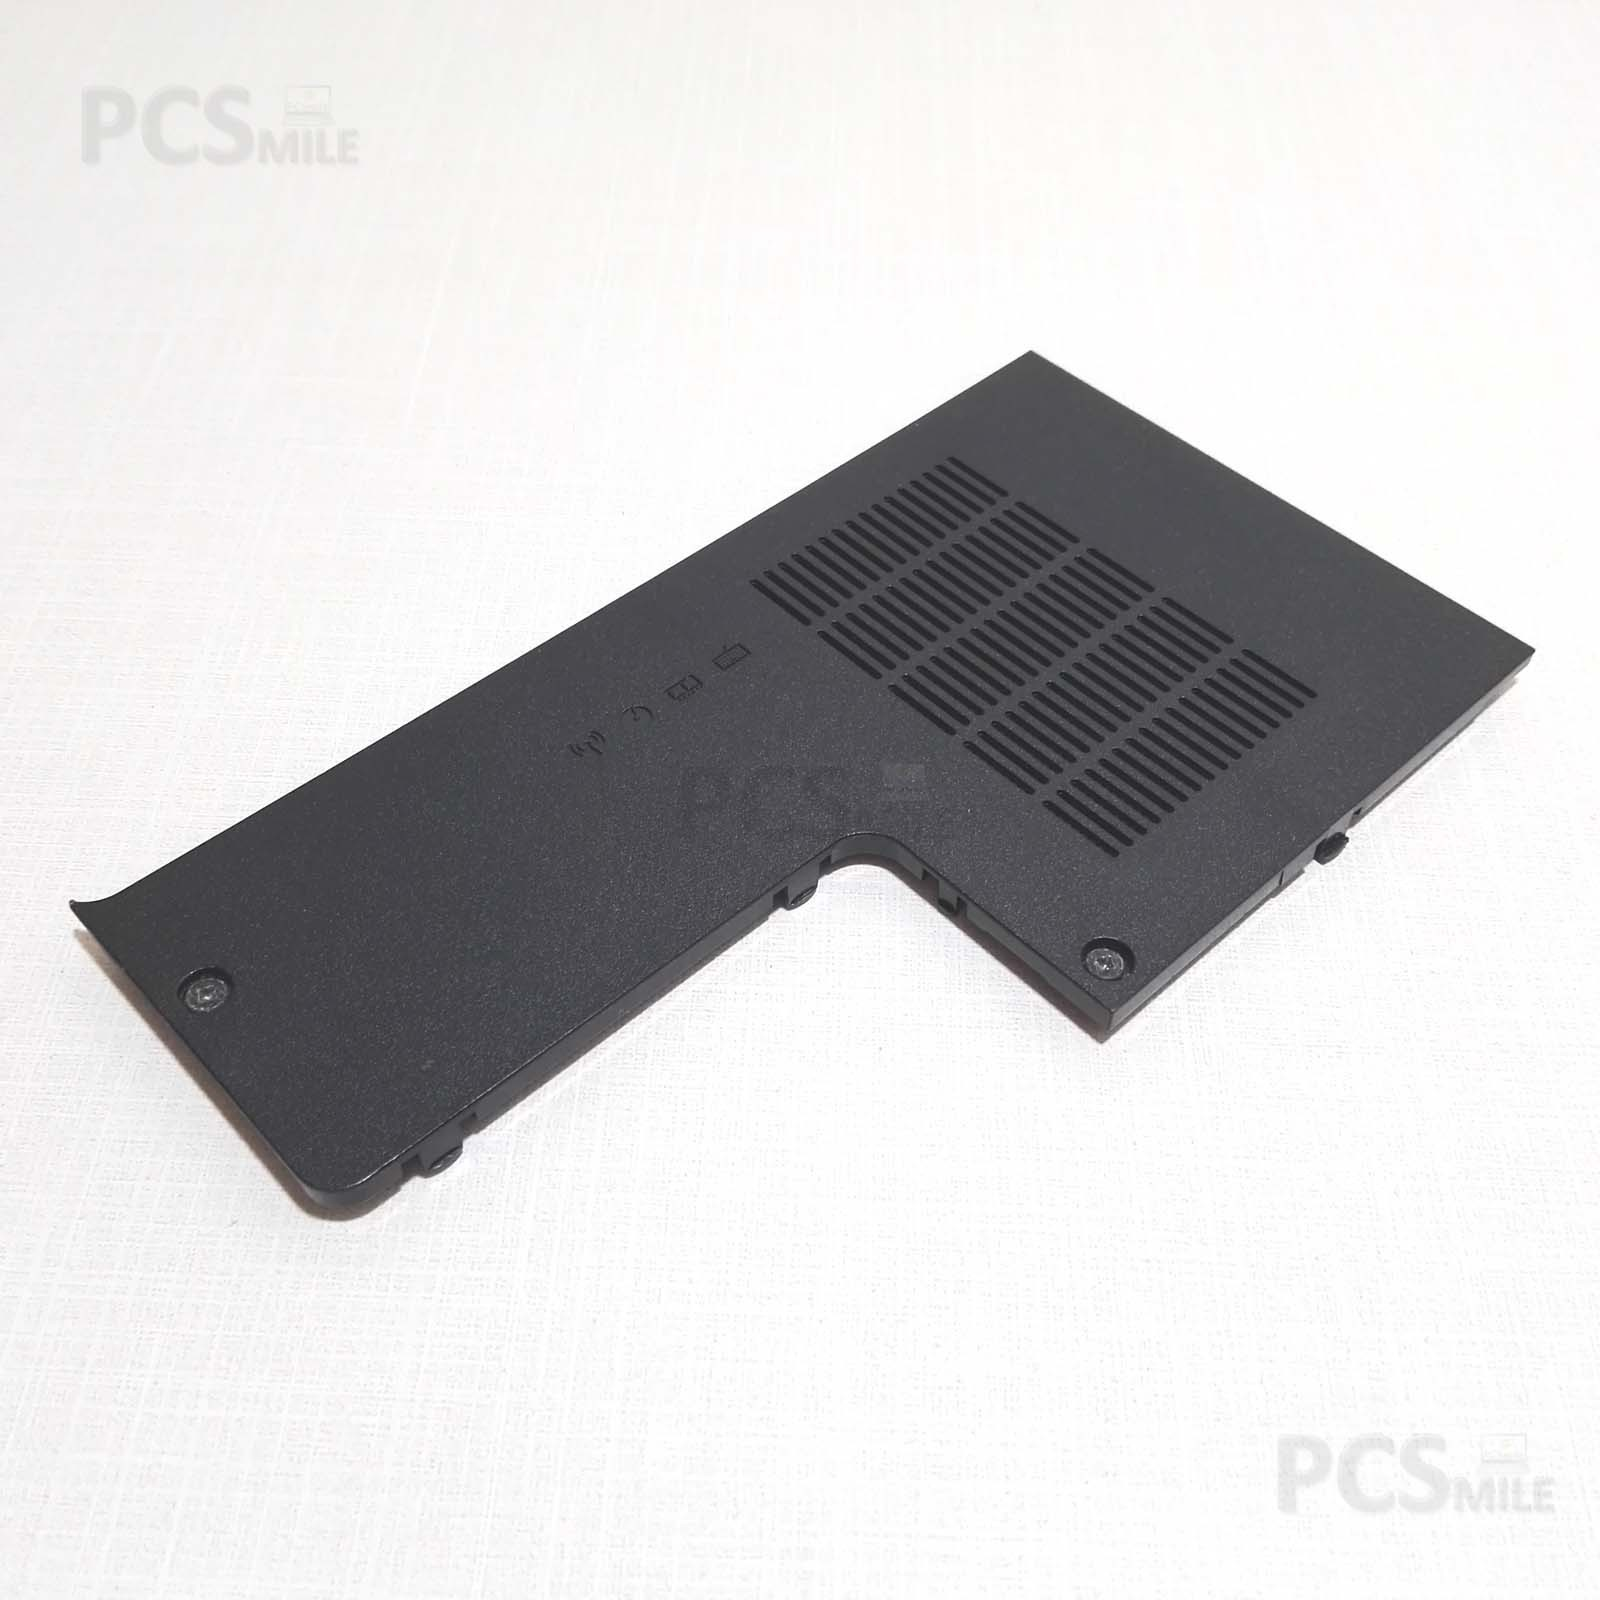 Tappo RAM originale HP G62 serie 1A226HC00-600-G CMSSTA-BND15-M02